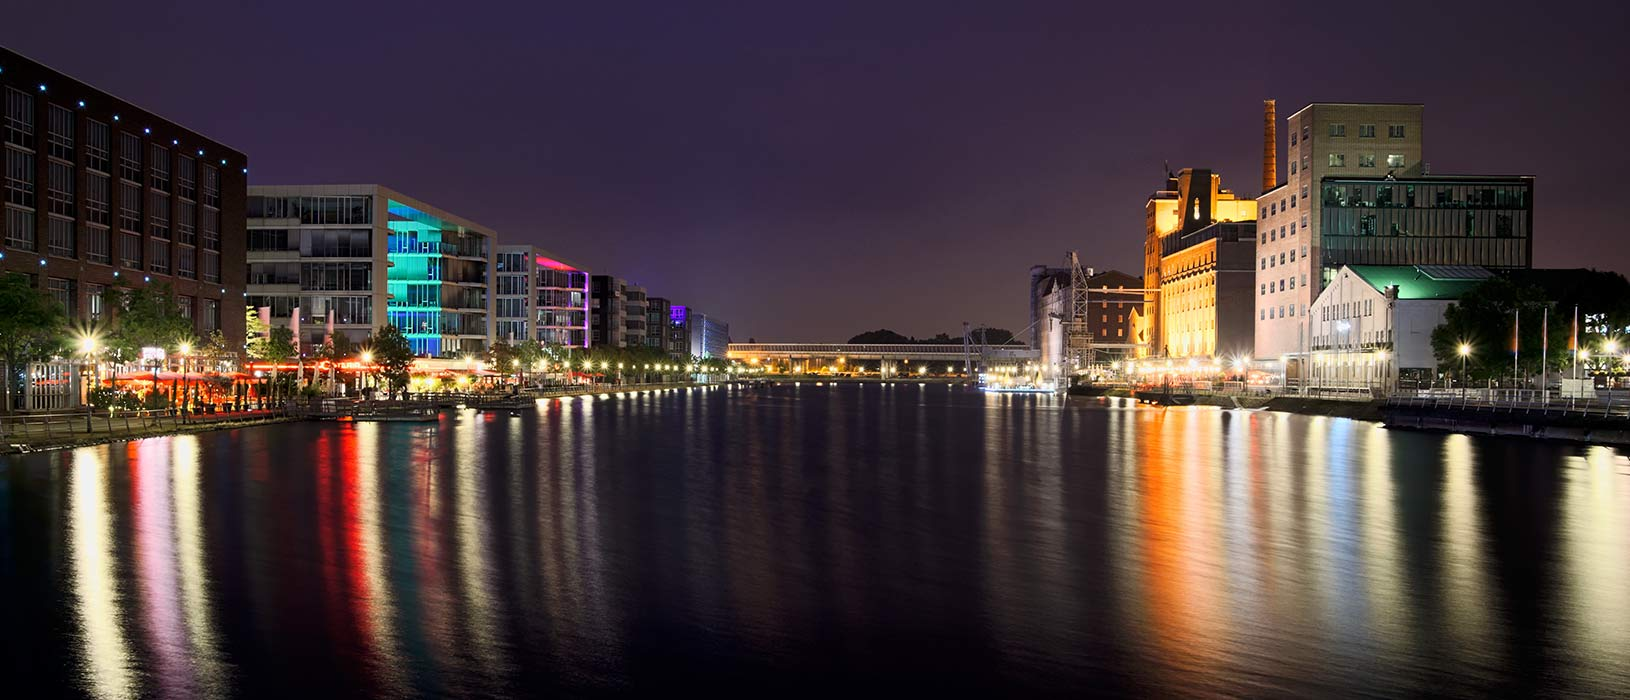 Duisburg soll zur Digitalen Modellstadt in Westeuropa ausgebaut werden. Foto: Pixabay